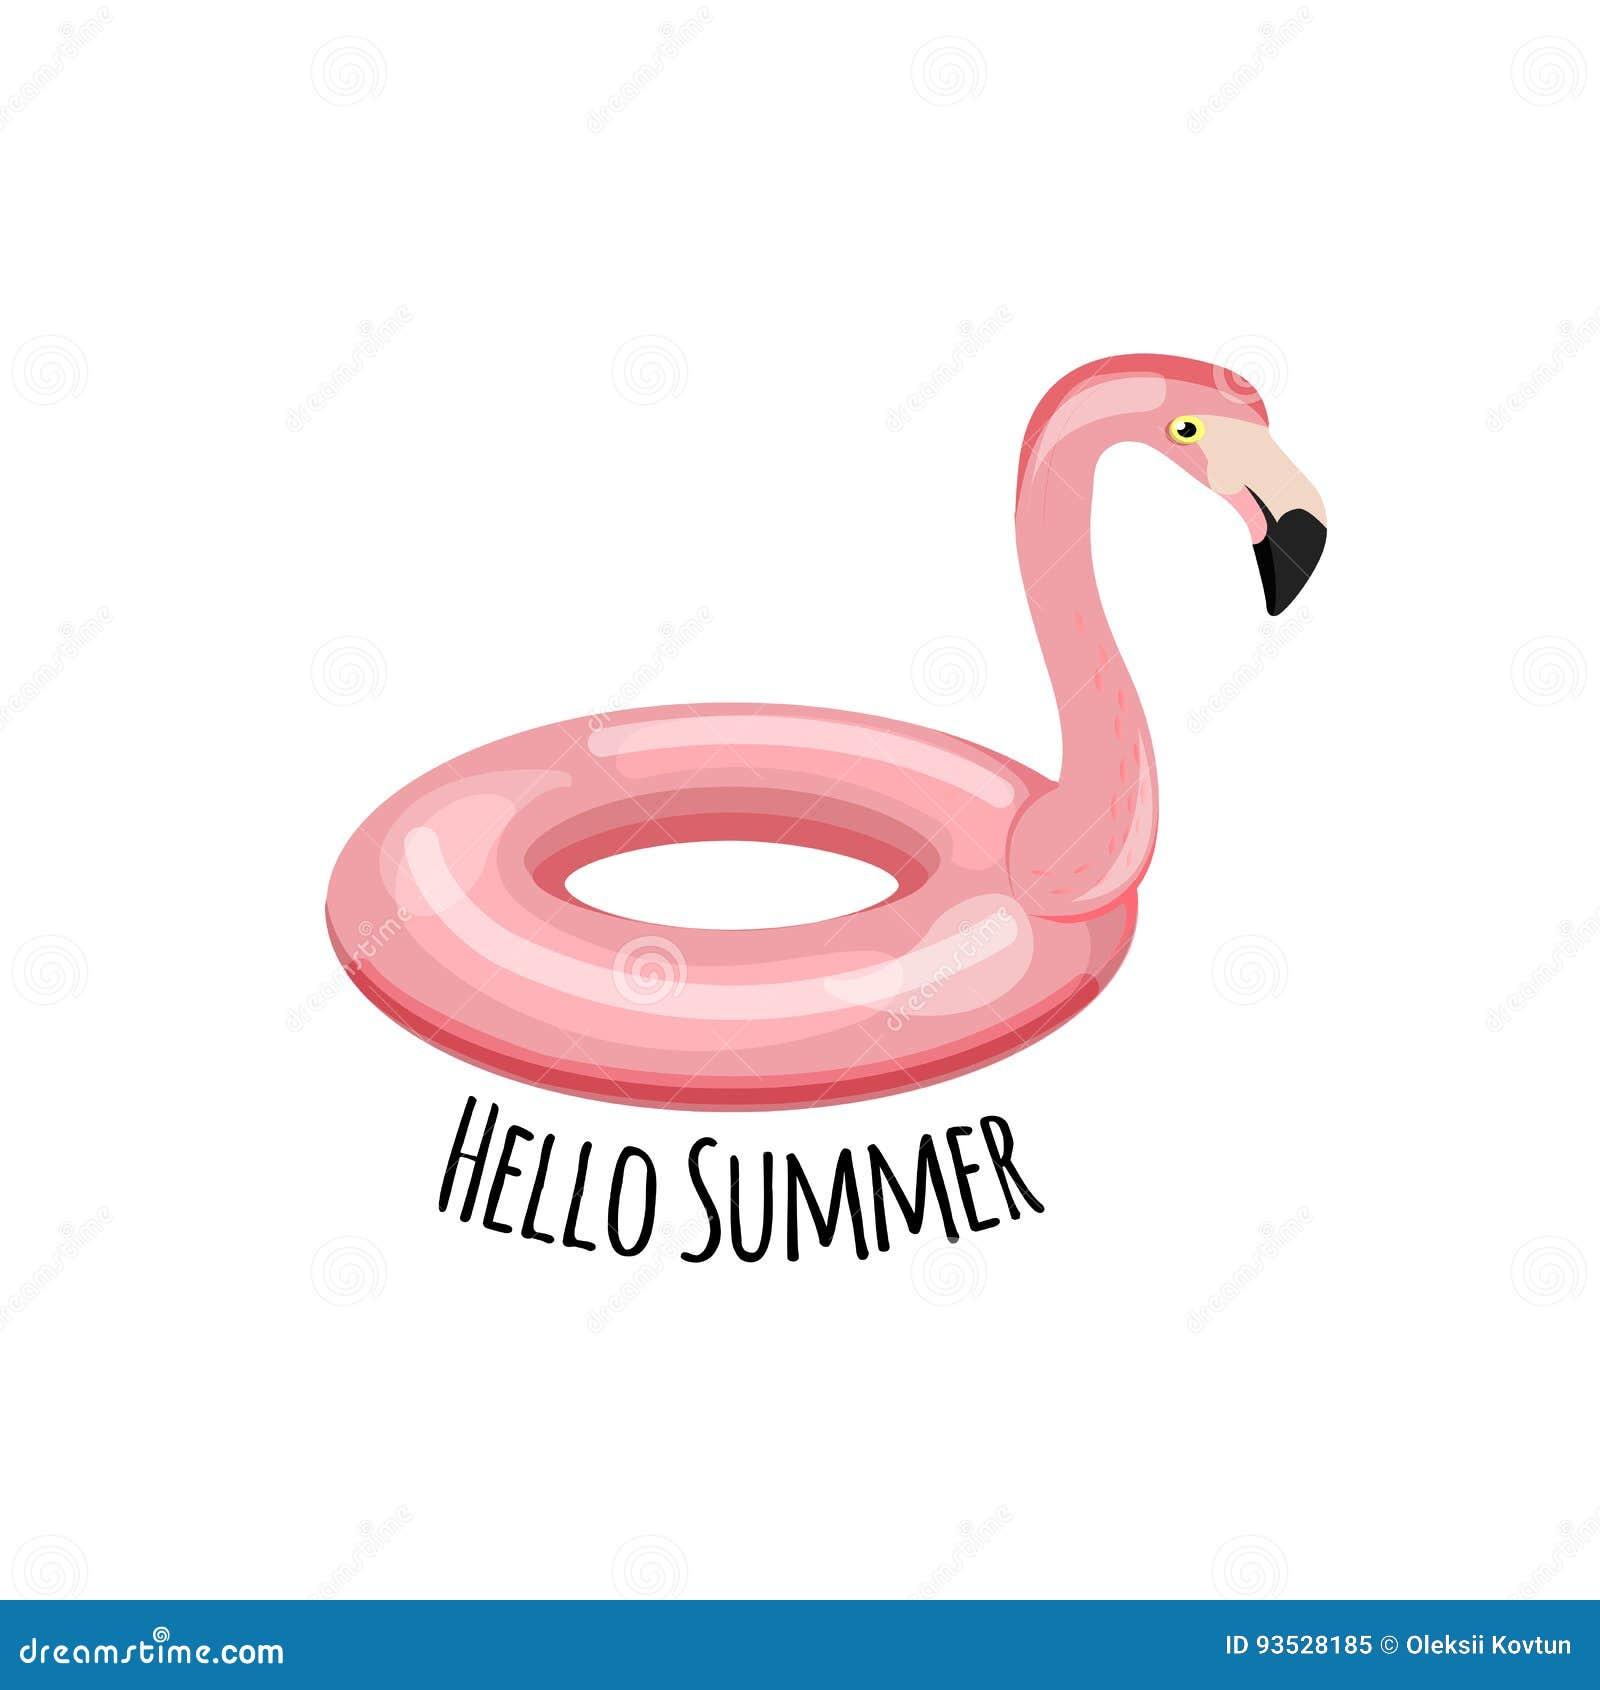 Swim Ring Shape Of Flamingo Vector Illustration Cartoon